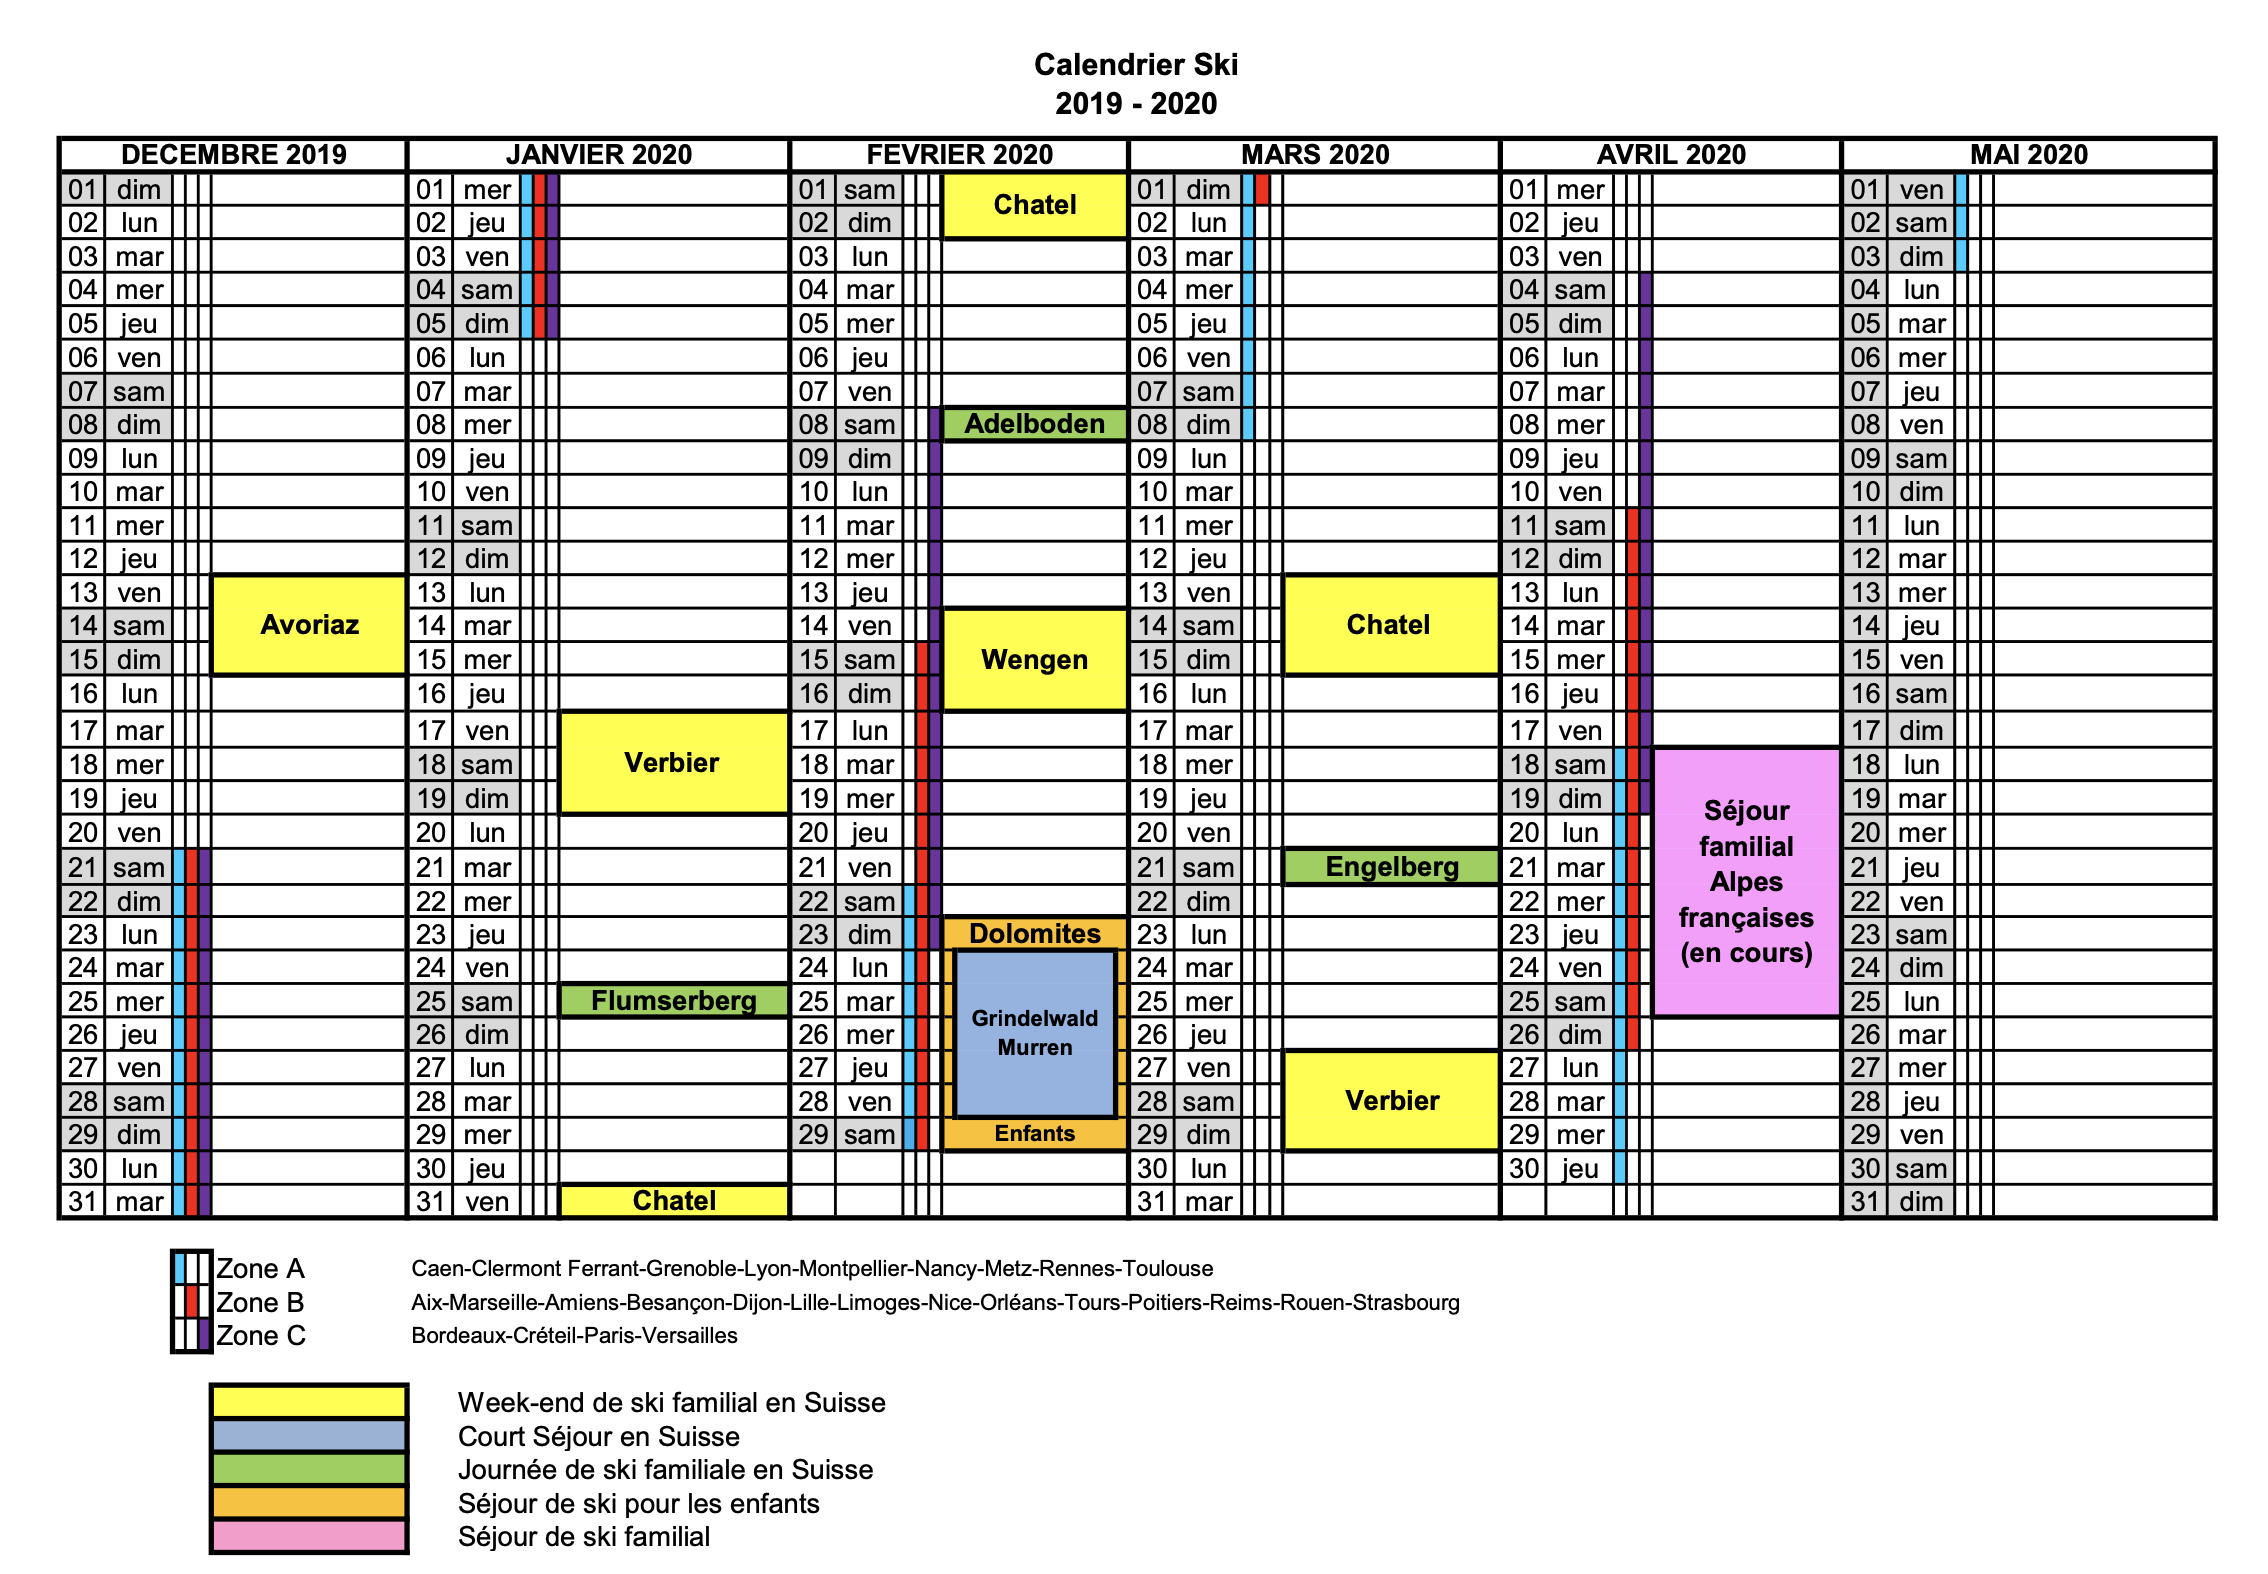 Image du calendrier ski 2019-2020